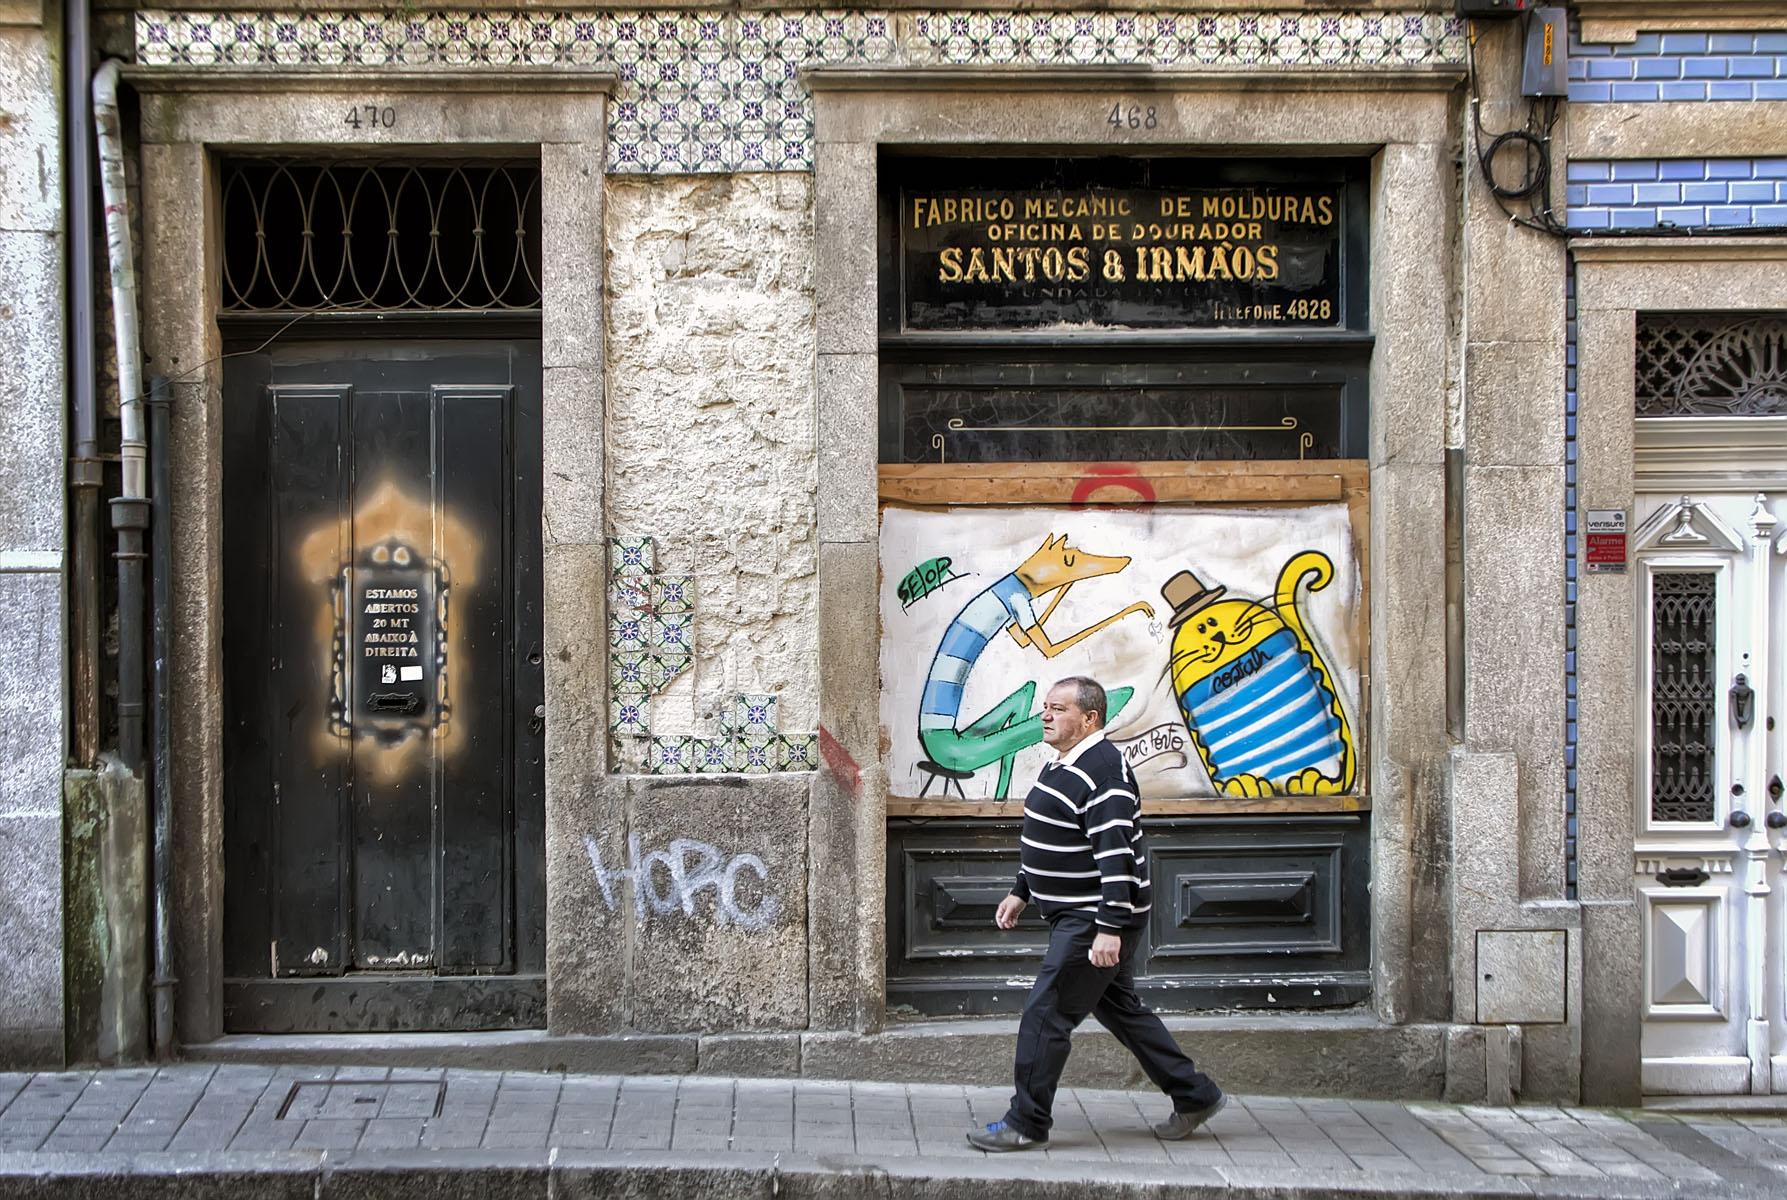 "Porto, Portugal, May 2017 No. 2   Archival pigment print  11.25"" x 16.75""  $300  Click image to enlarge   Inquire."